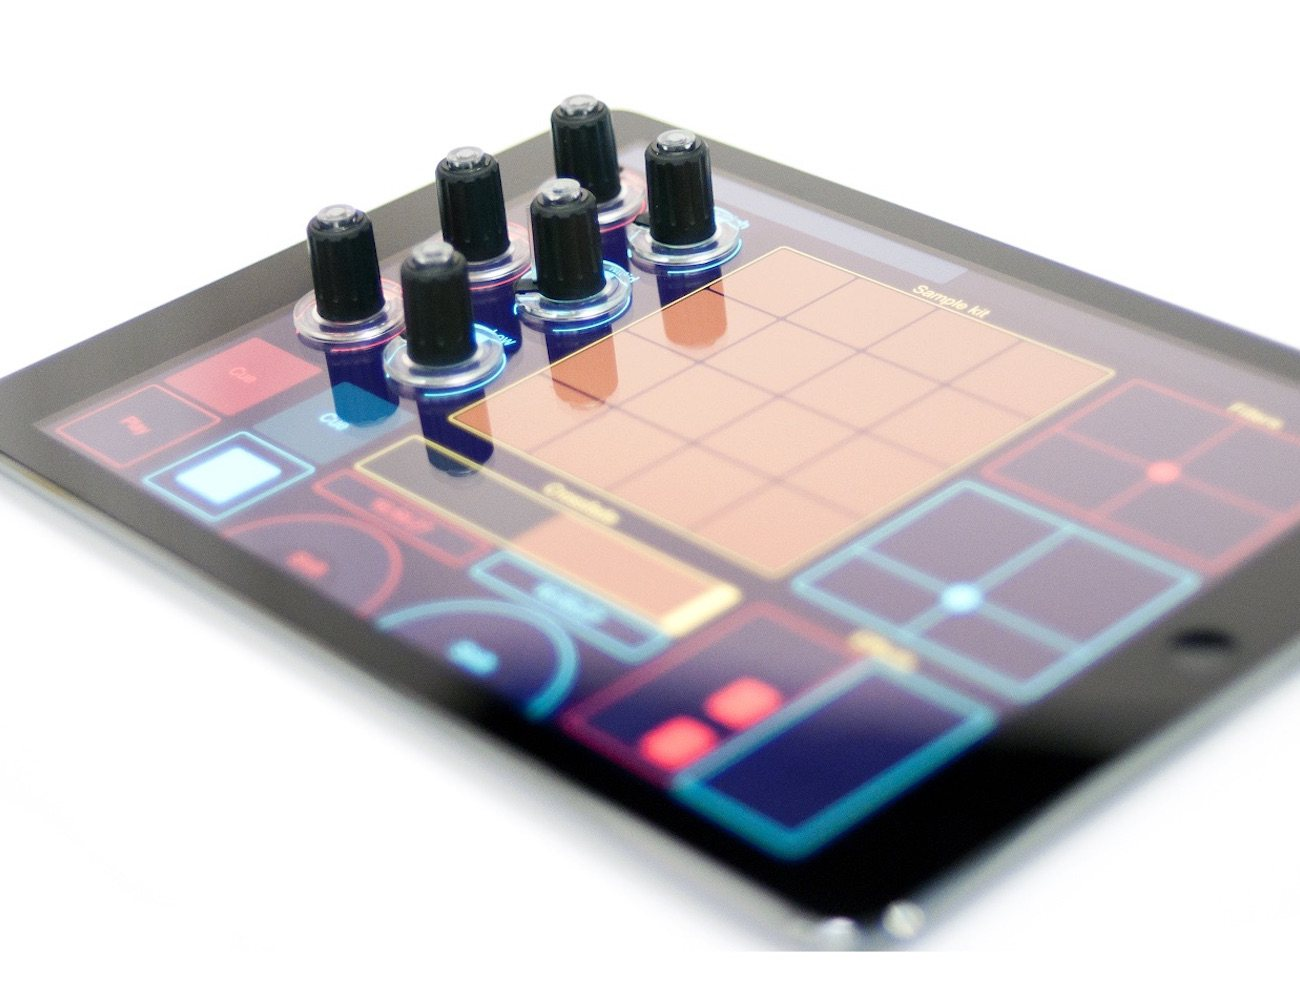 Tuna Tablet DJ Knobs